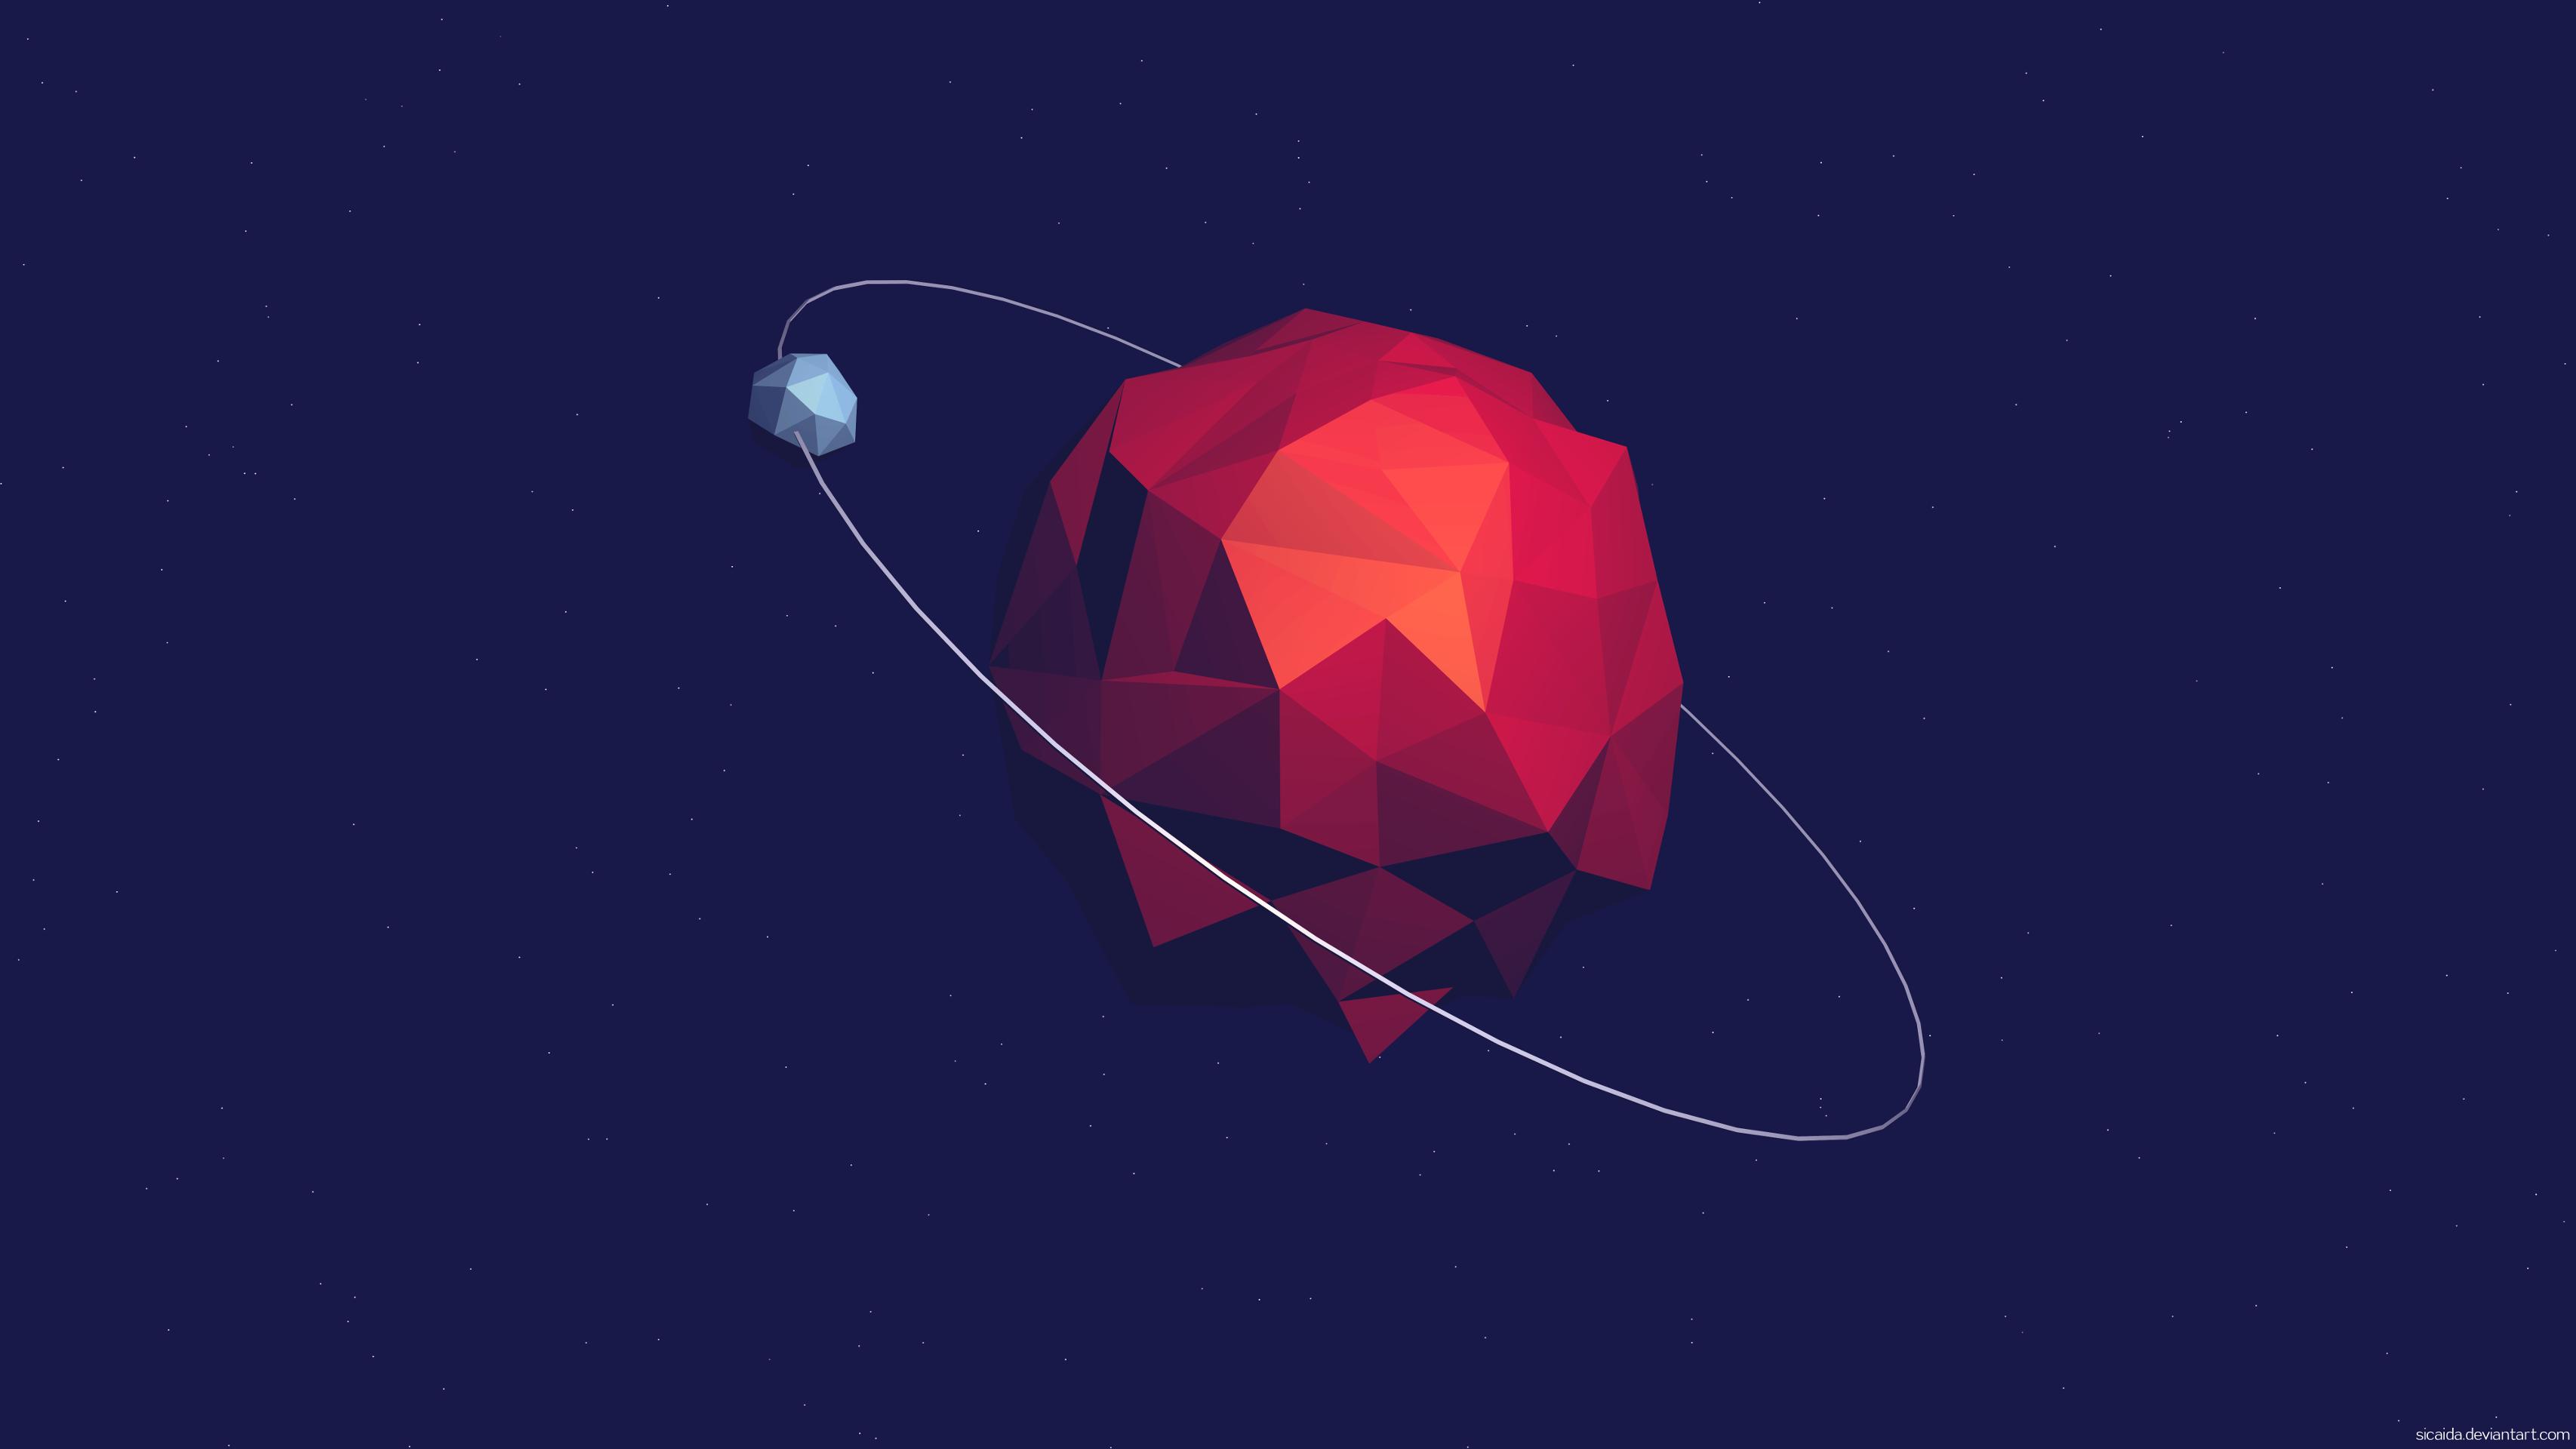 low poly planet by sicaida 3413x1920